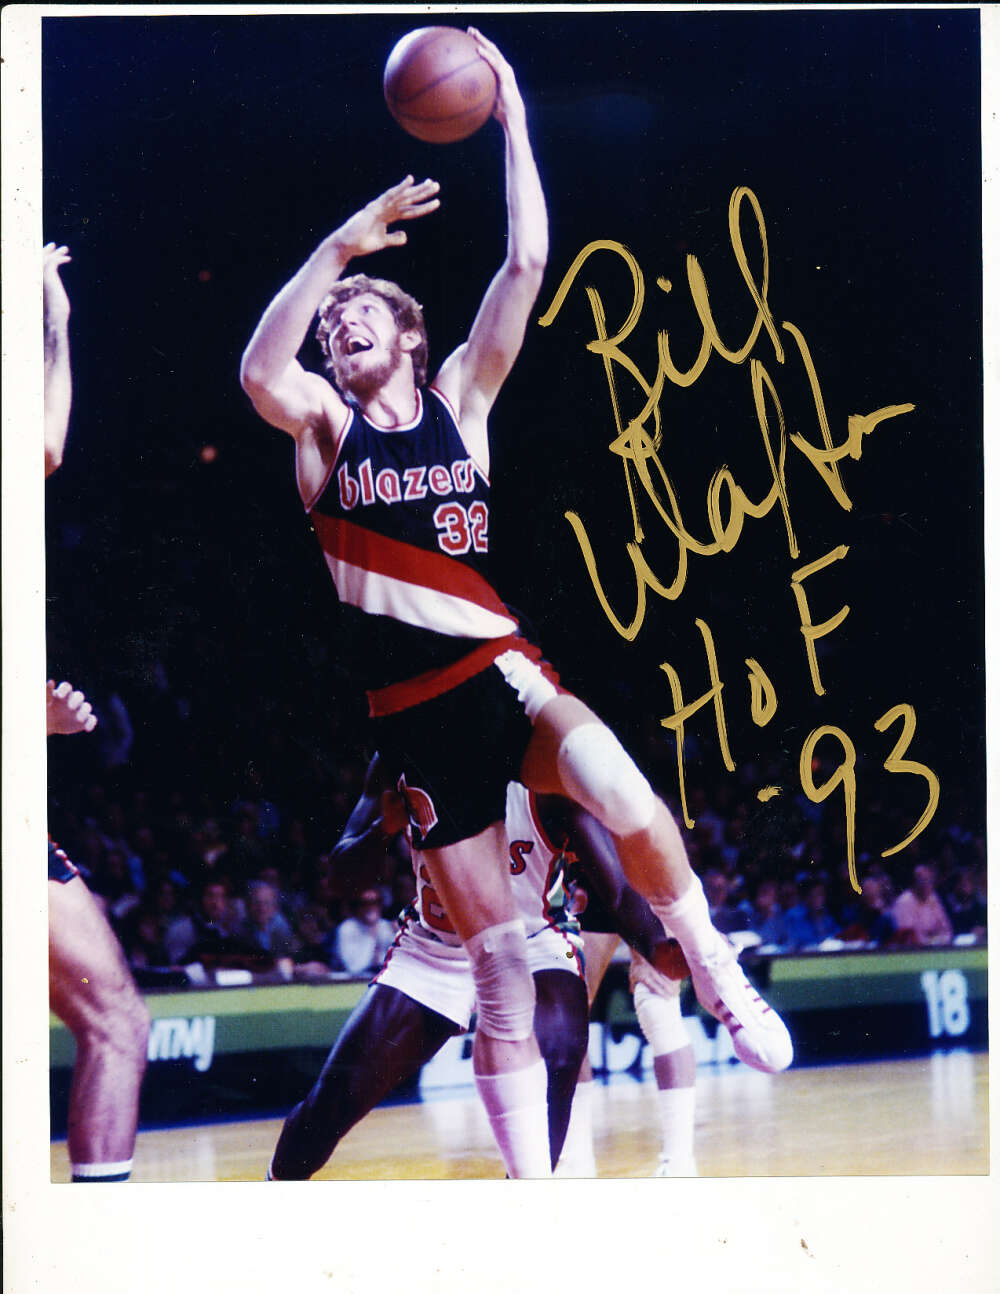 Bill Walton HOF 93 Blazers signed 8x10 photo